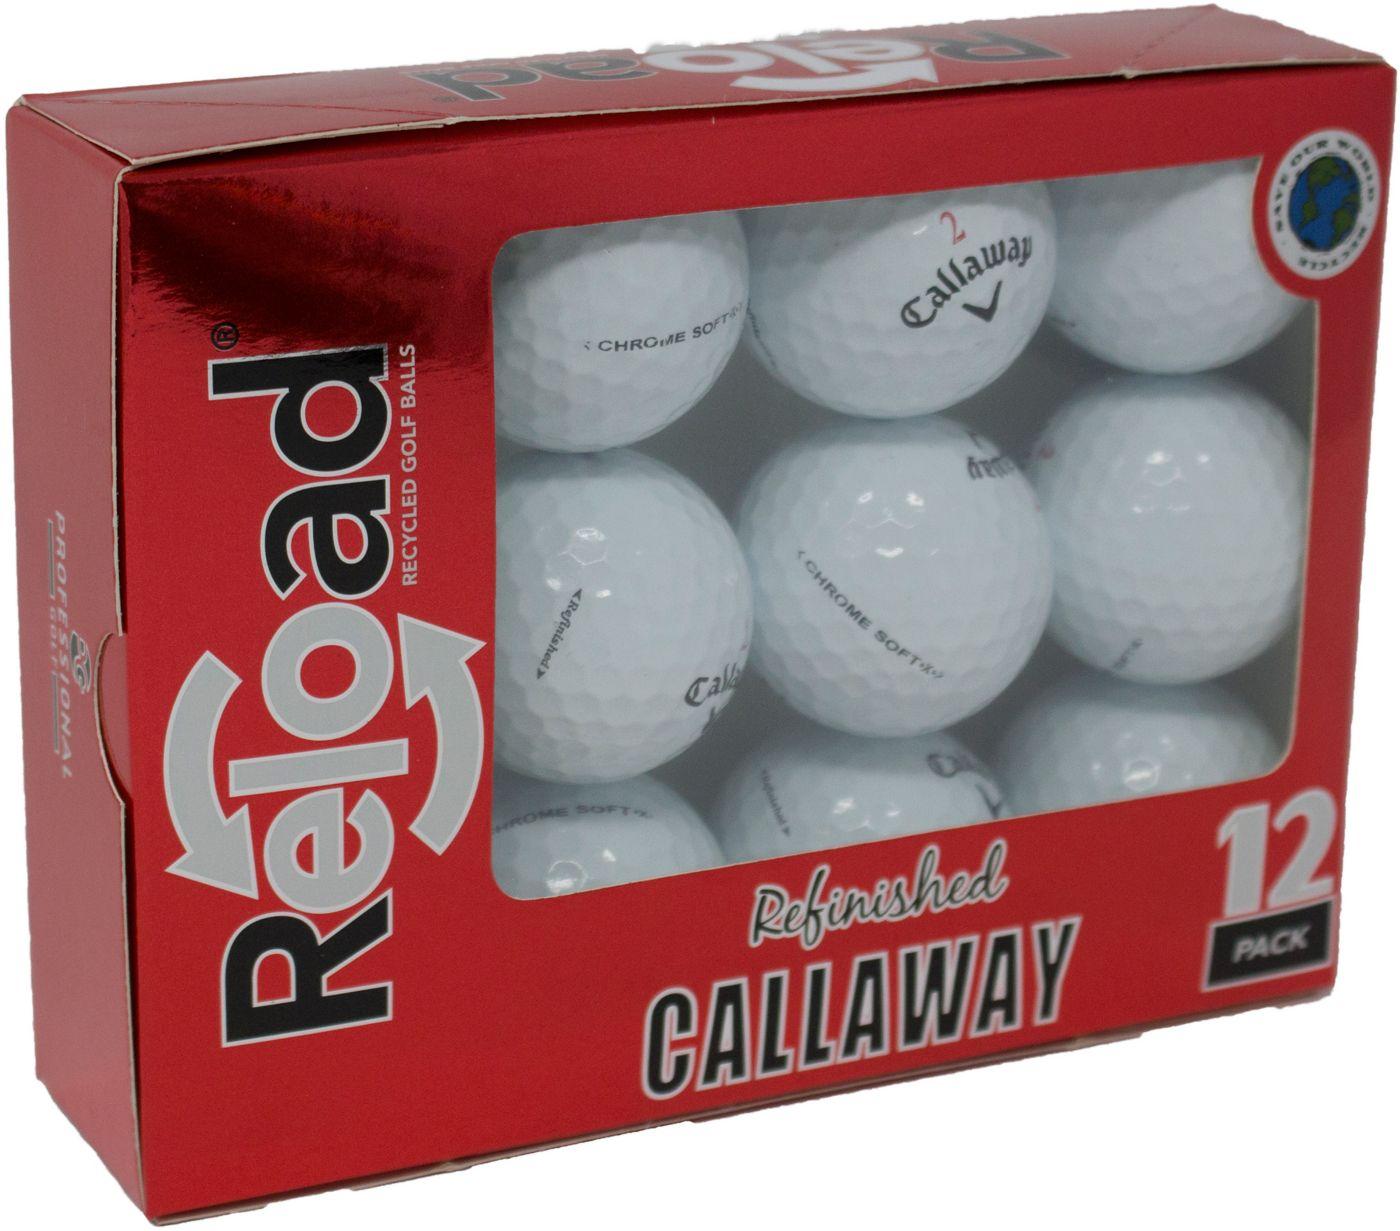 Refurbished Callaway Chrome Soft X Golf Balls